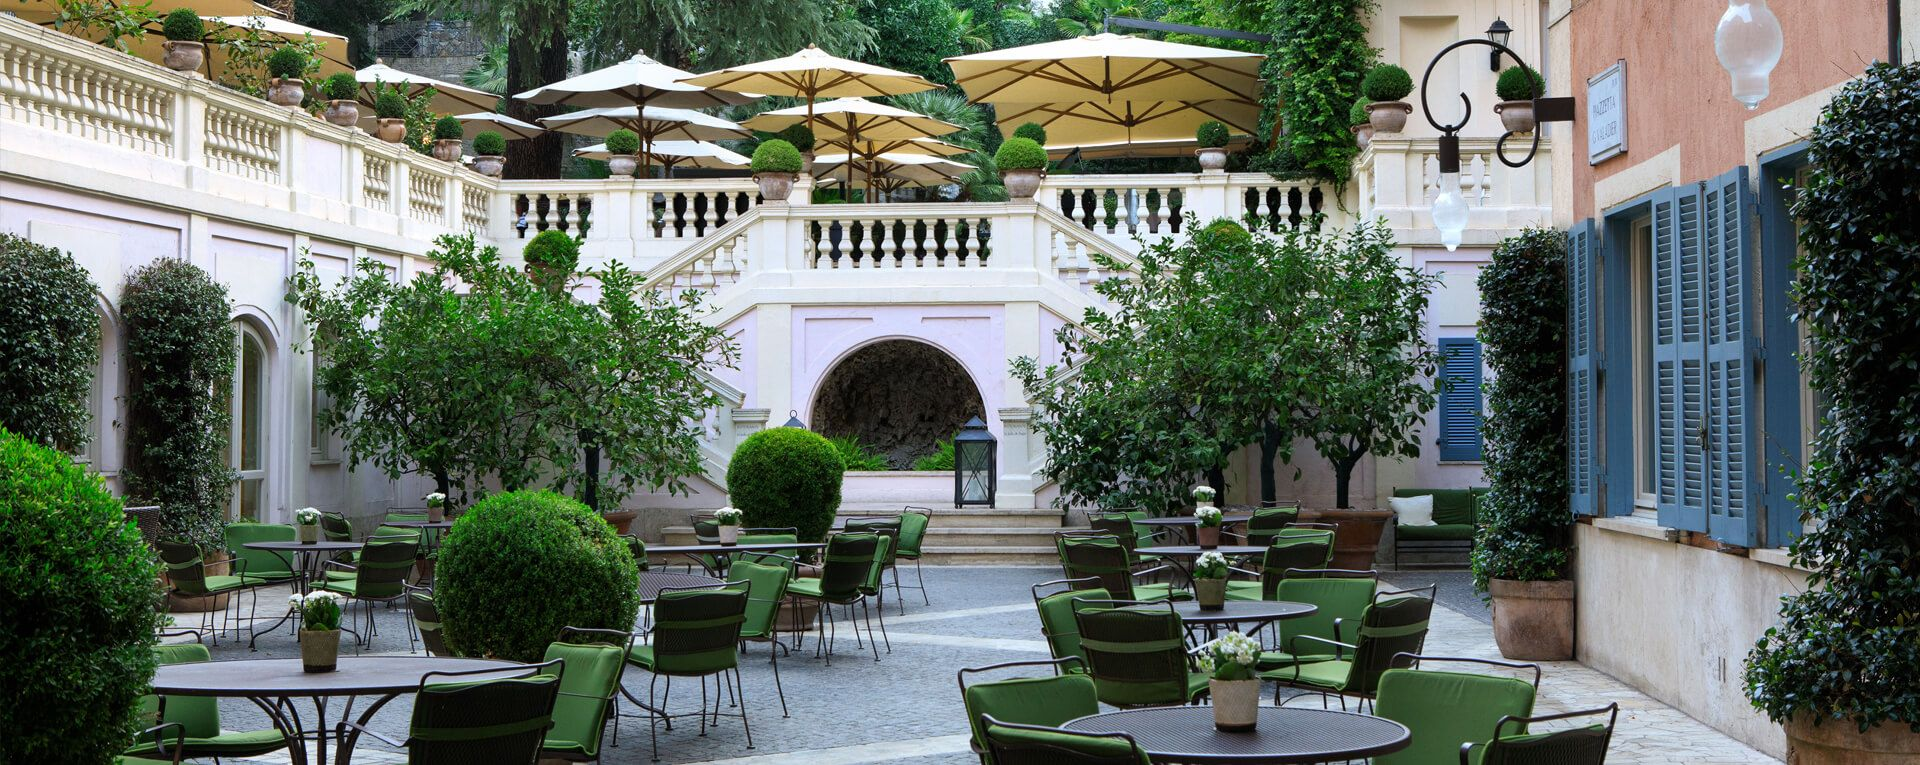 Hotel De Russie, a Rocco Forte Hotel